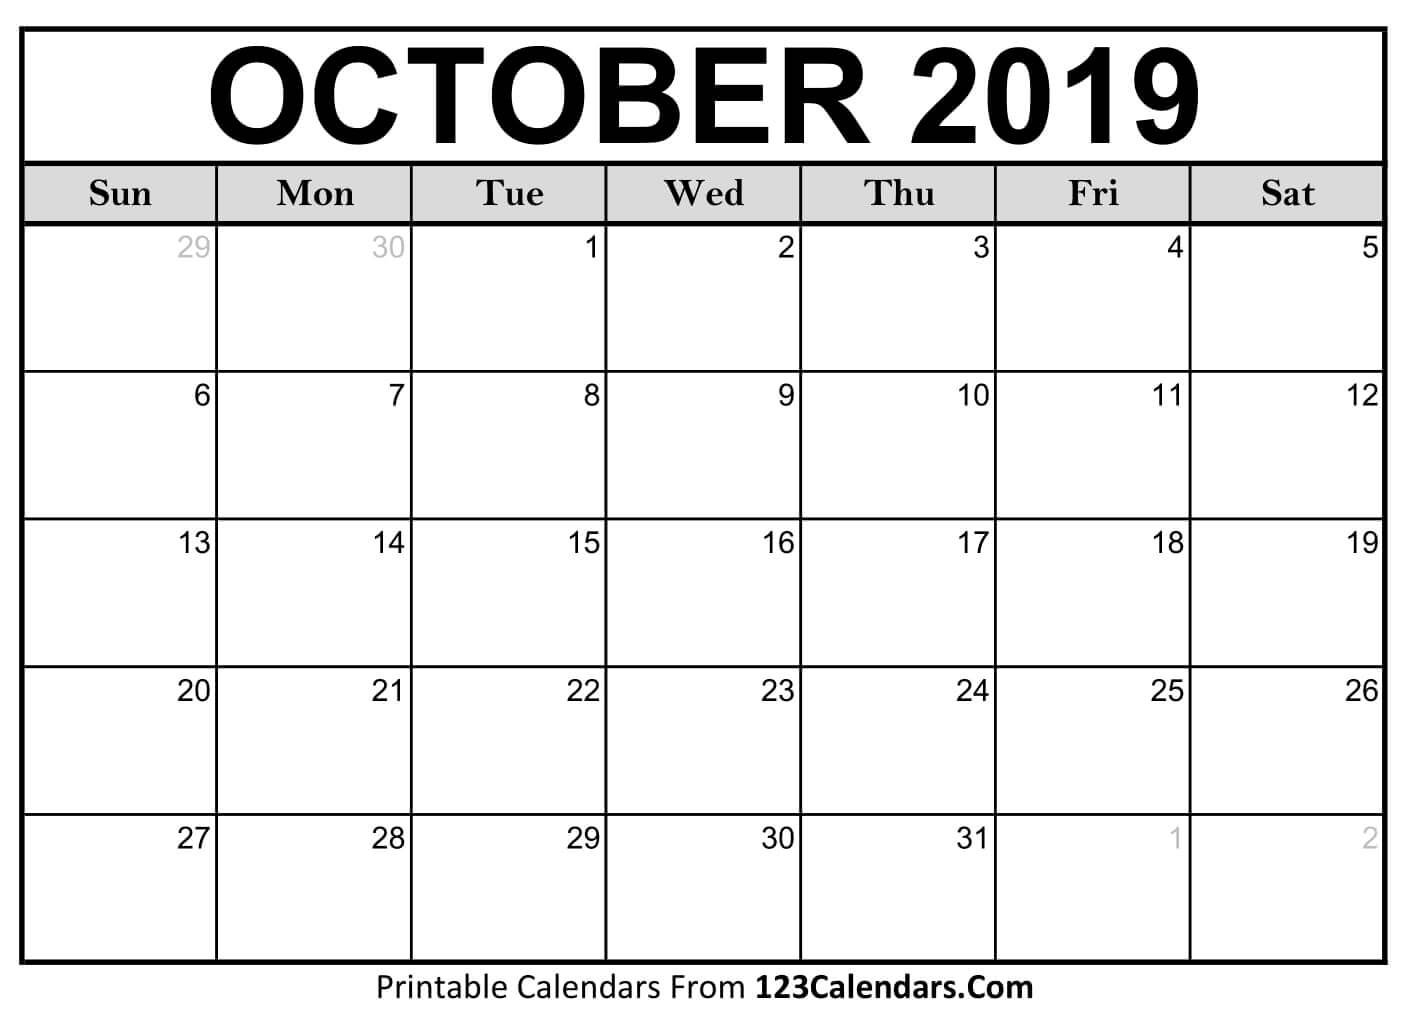 Printable October 2019 Calendar Templates – 123Calendars Calendar 2019 October